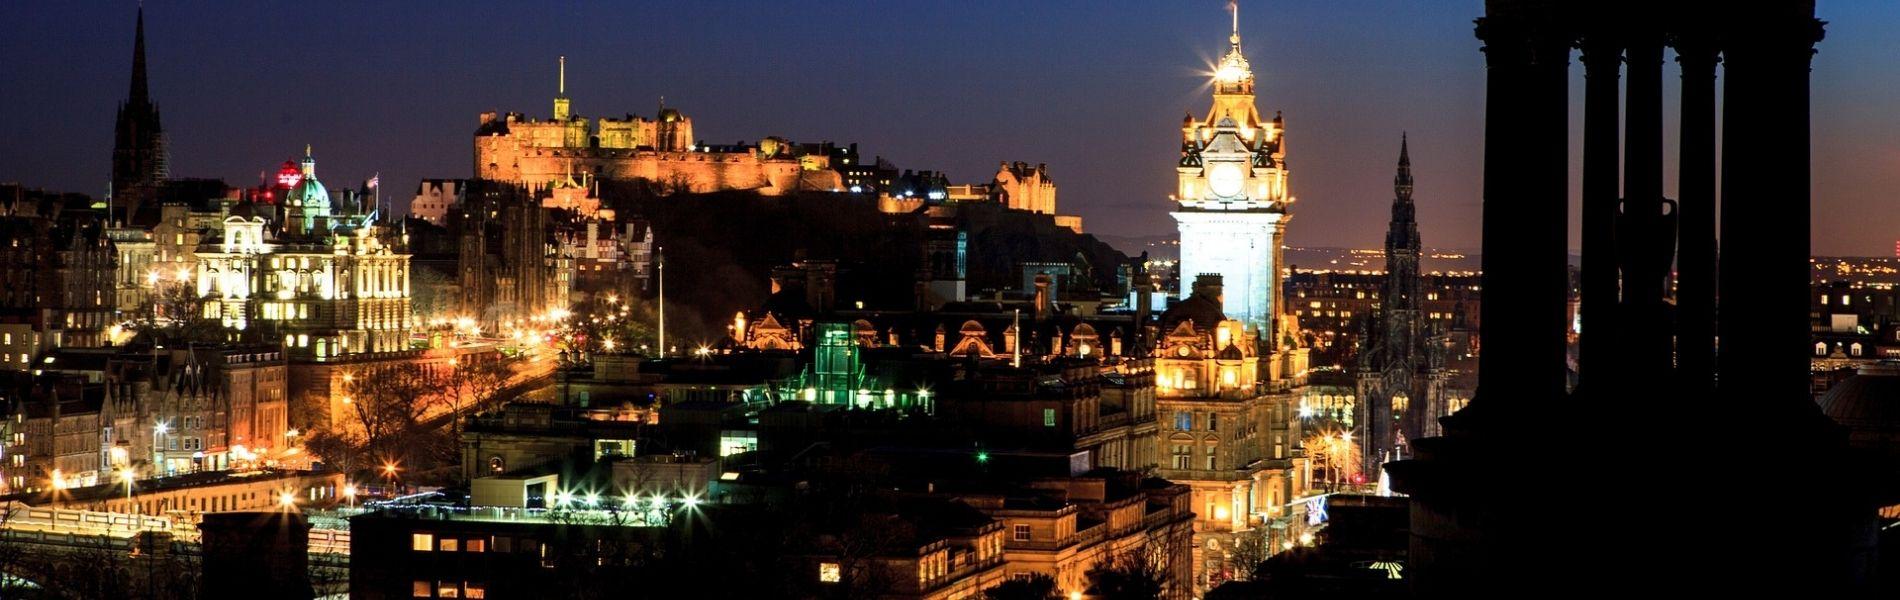 Curiosities About Scotland and Edinburgh